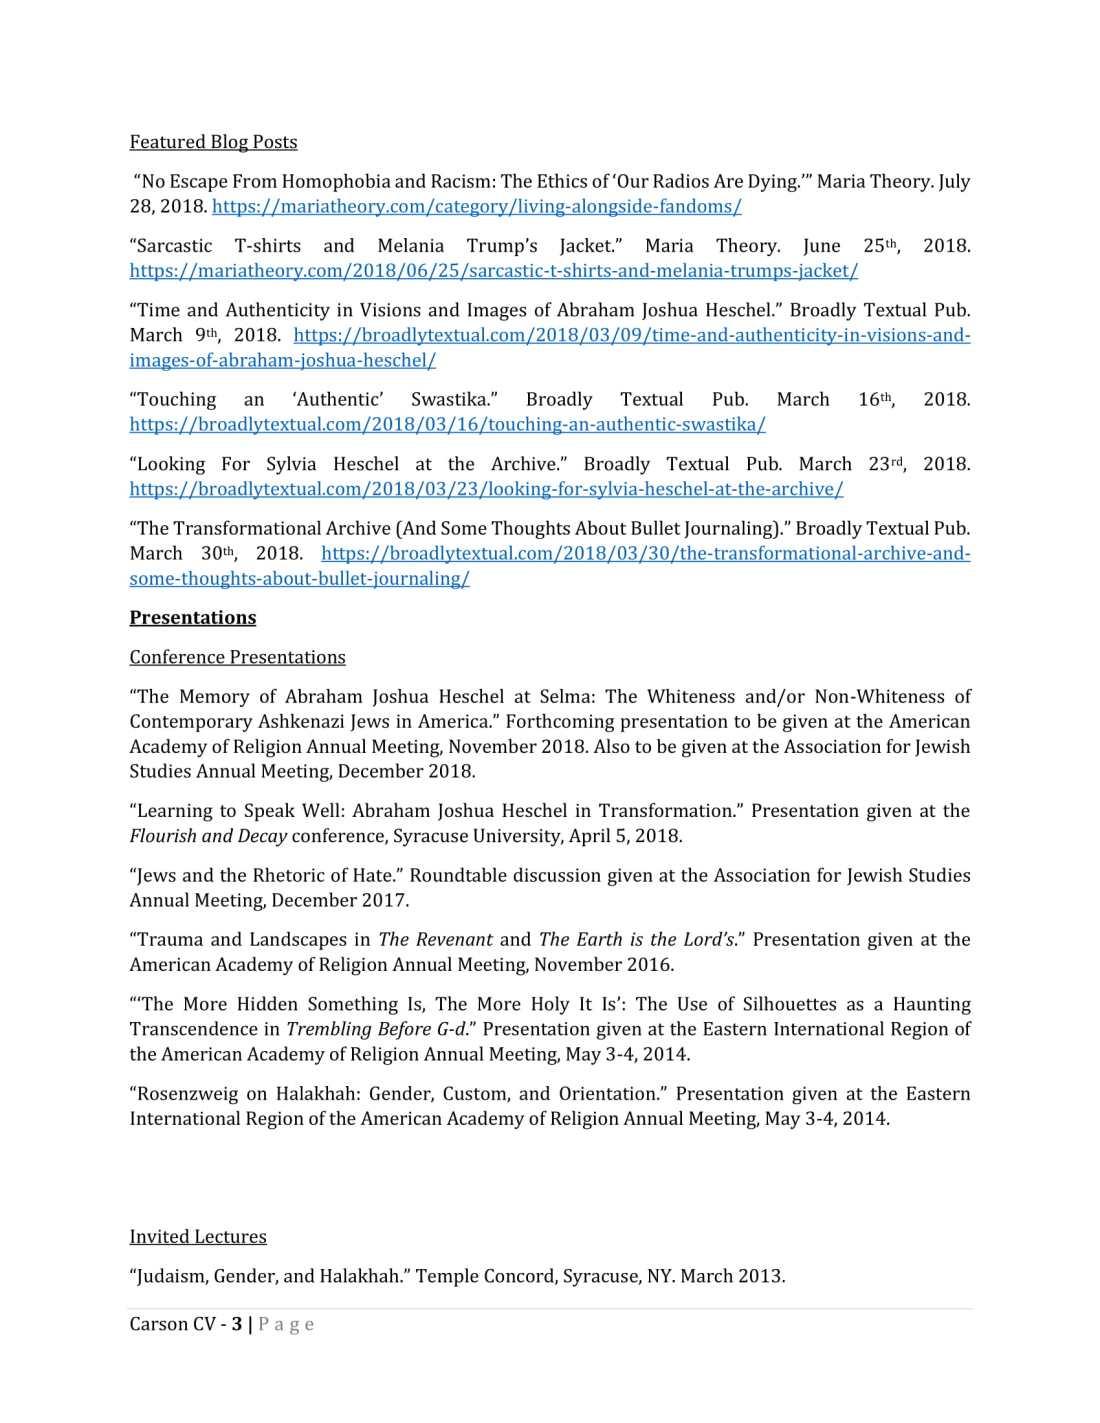 CV carson academic-3